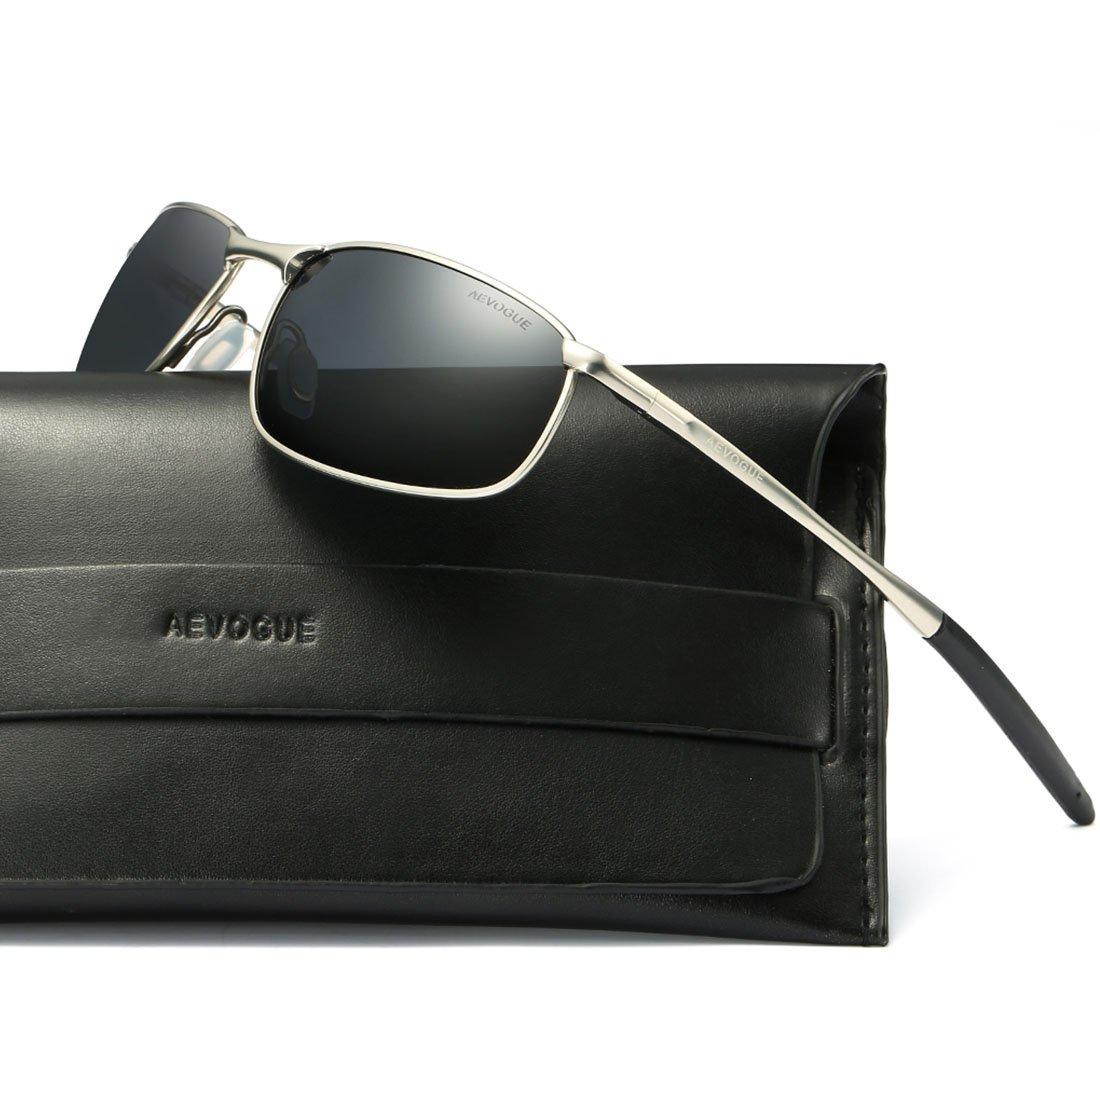 2884c806228 AEVOGUE Polarized Sunglasses For Men Rectangle Metal Frame Retro Sun Glasses